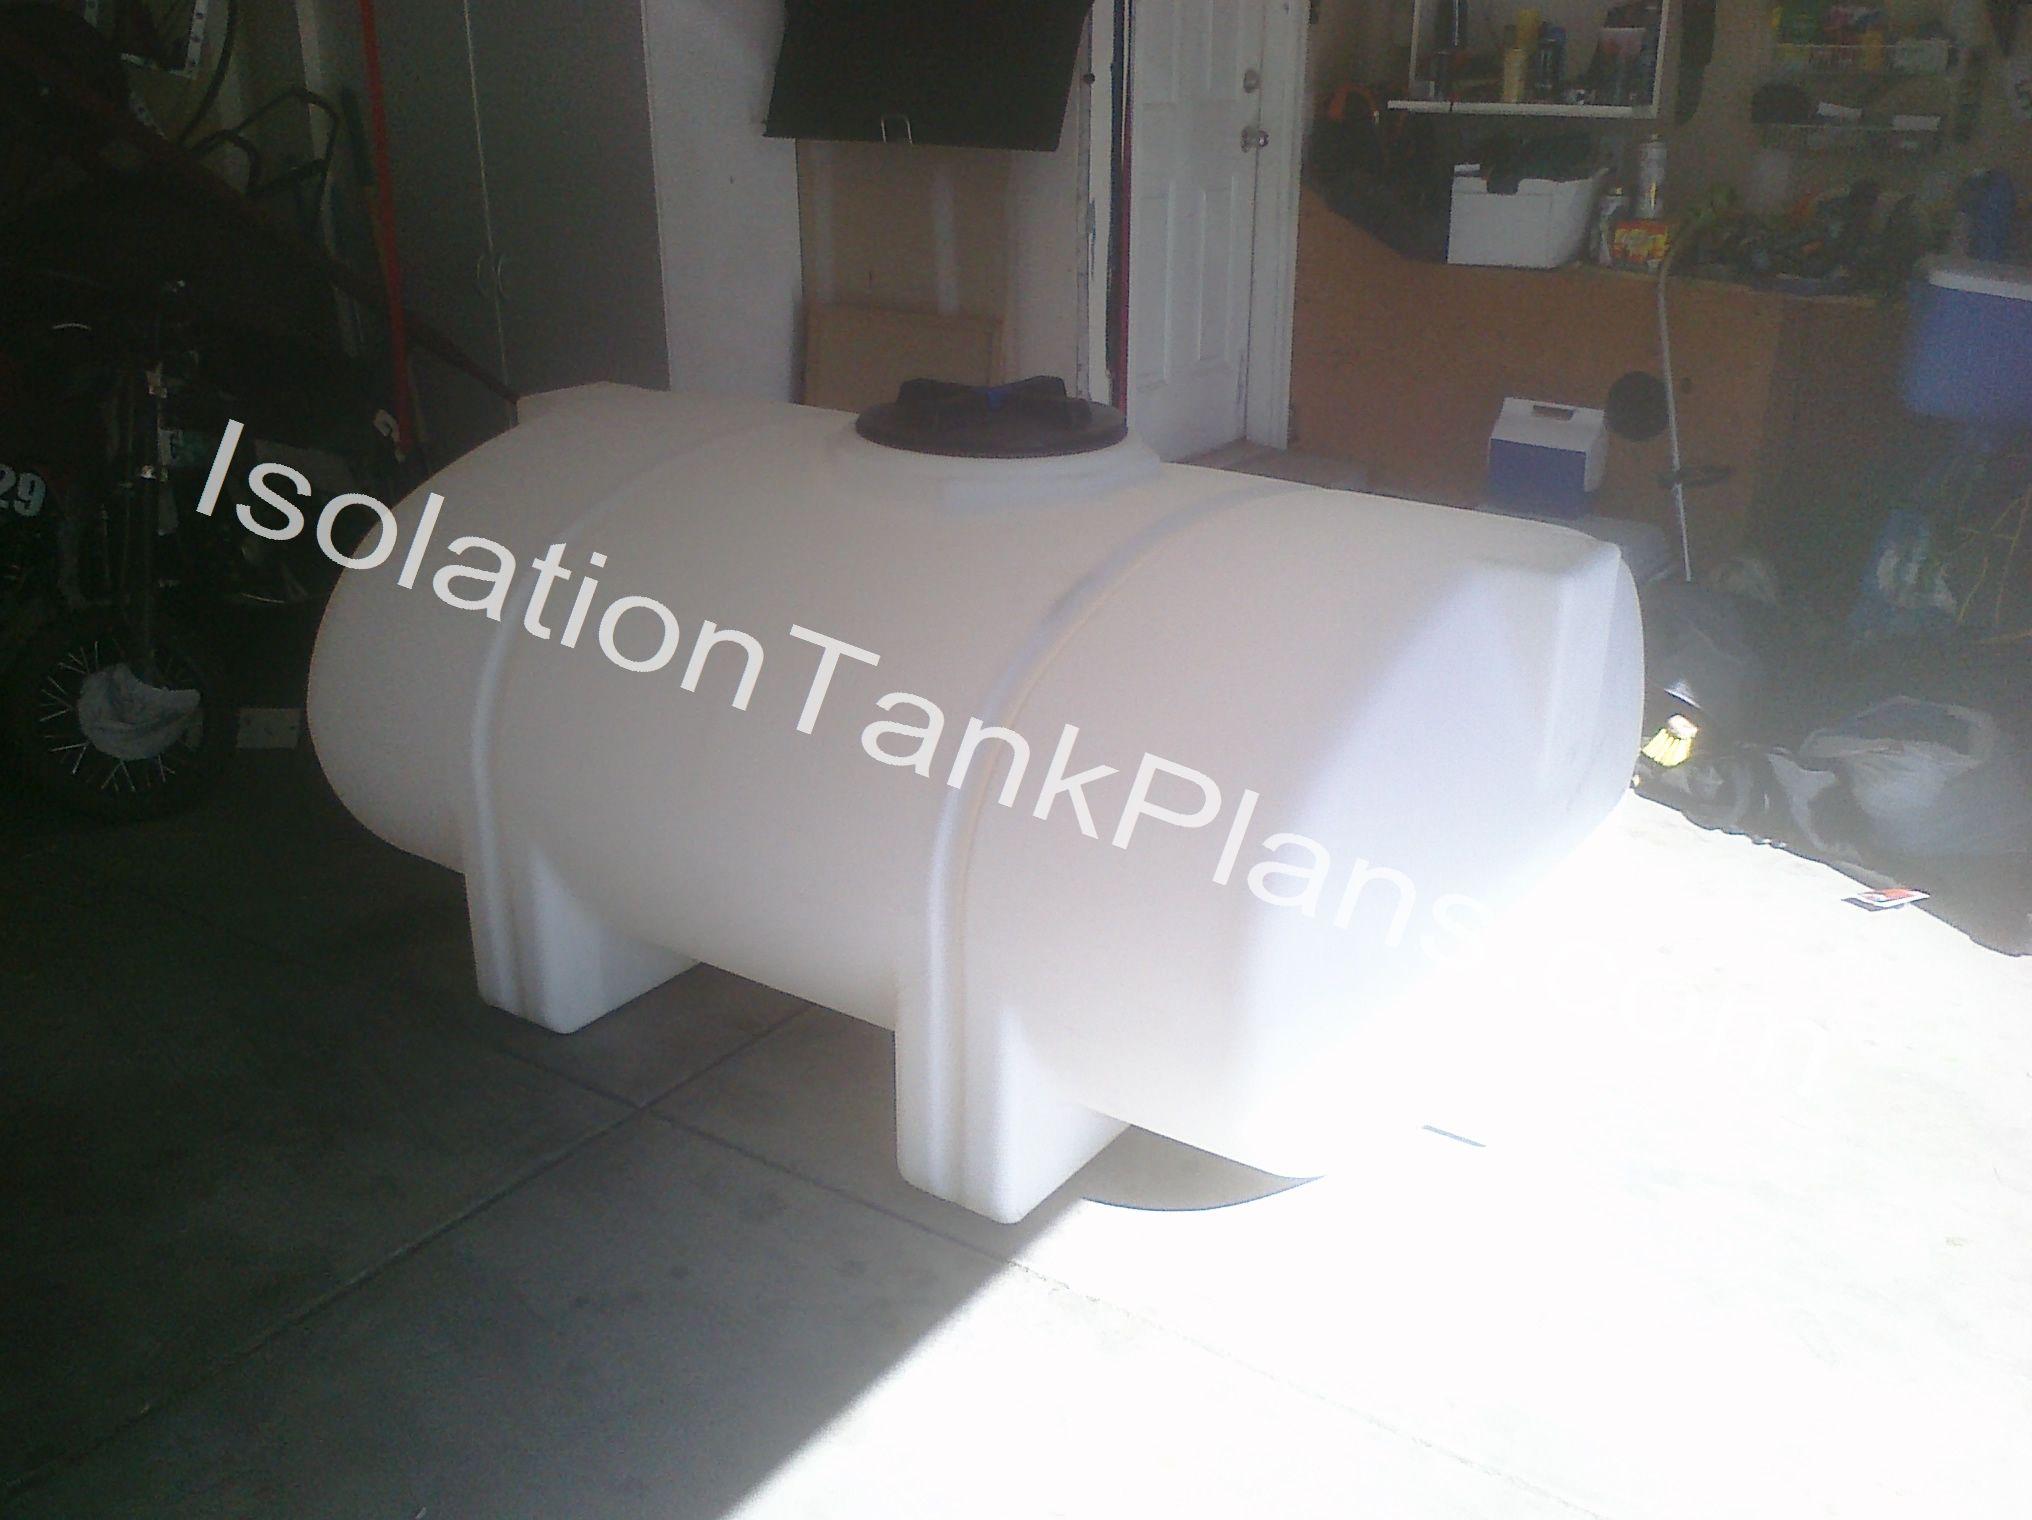 Uncut Isolation Float Tank Diy In 2019 Diy Tank